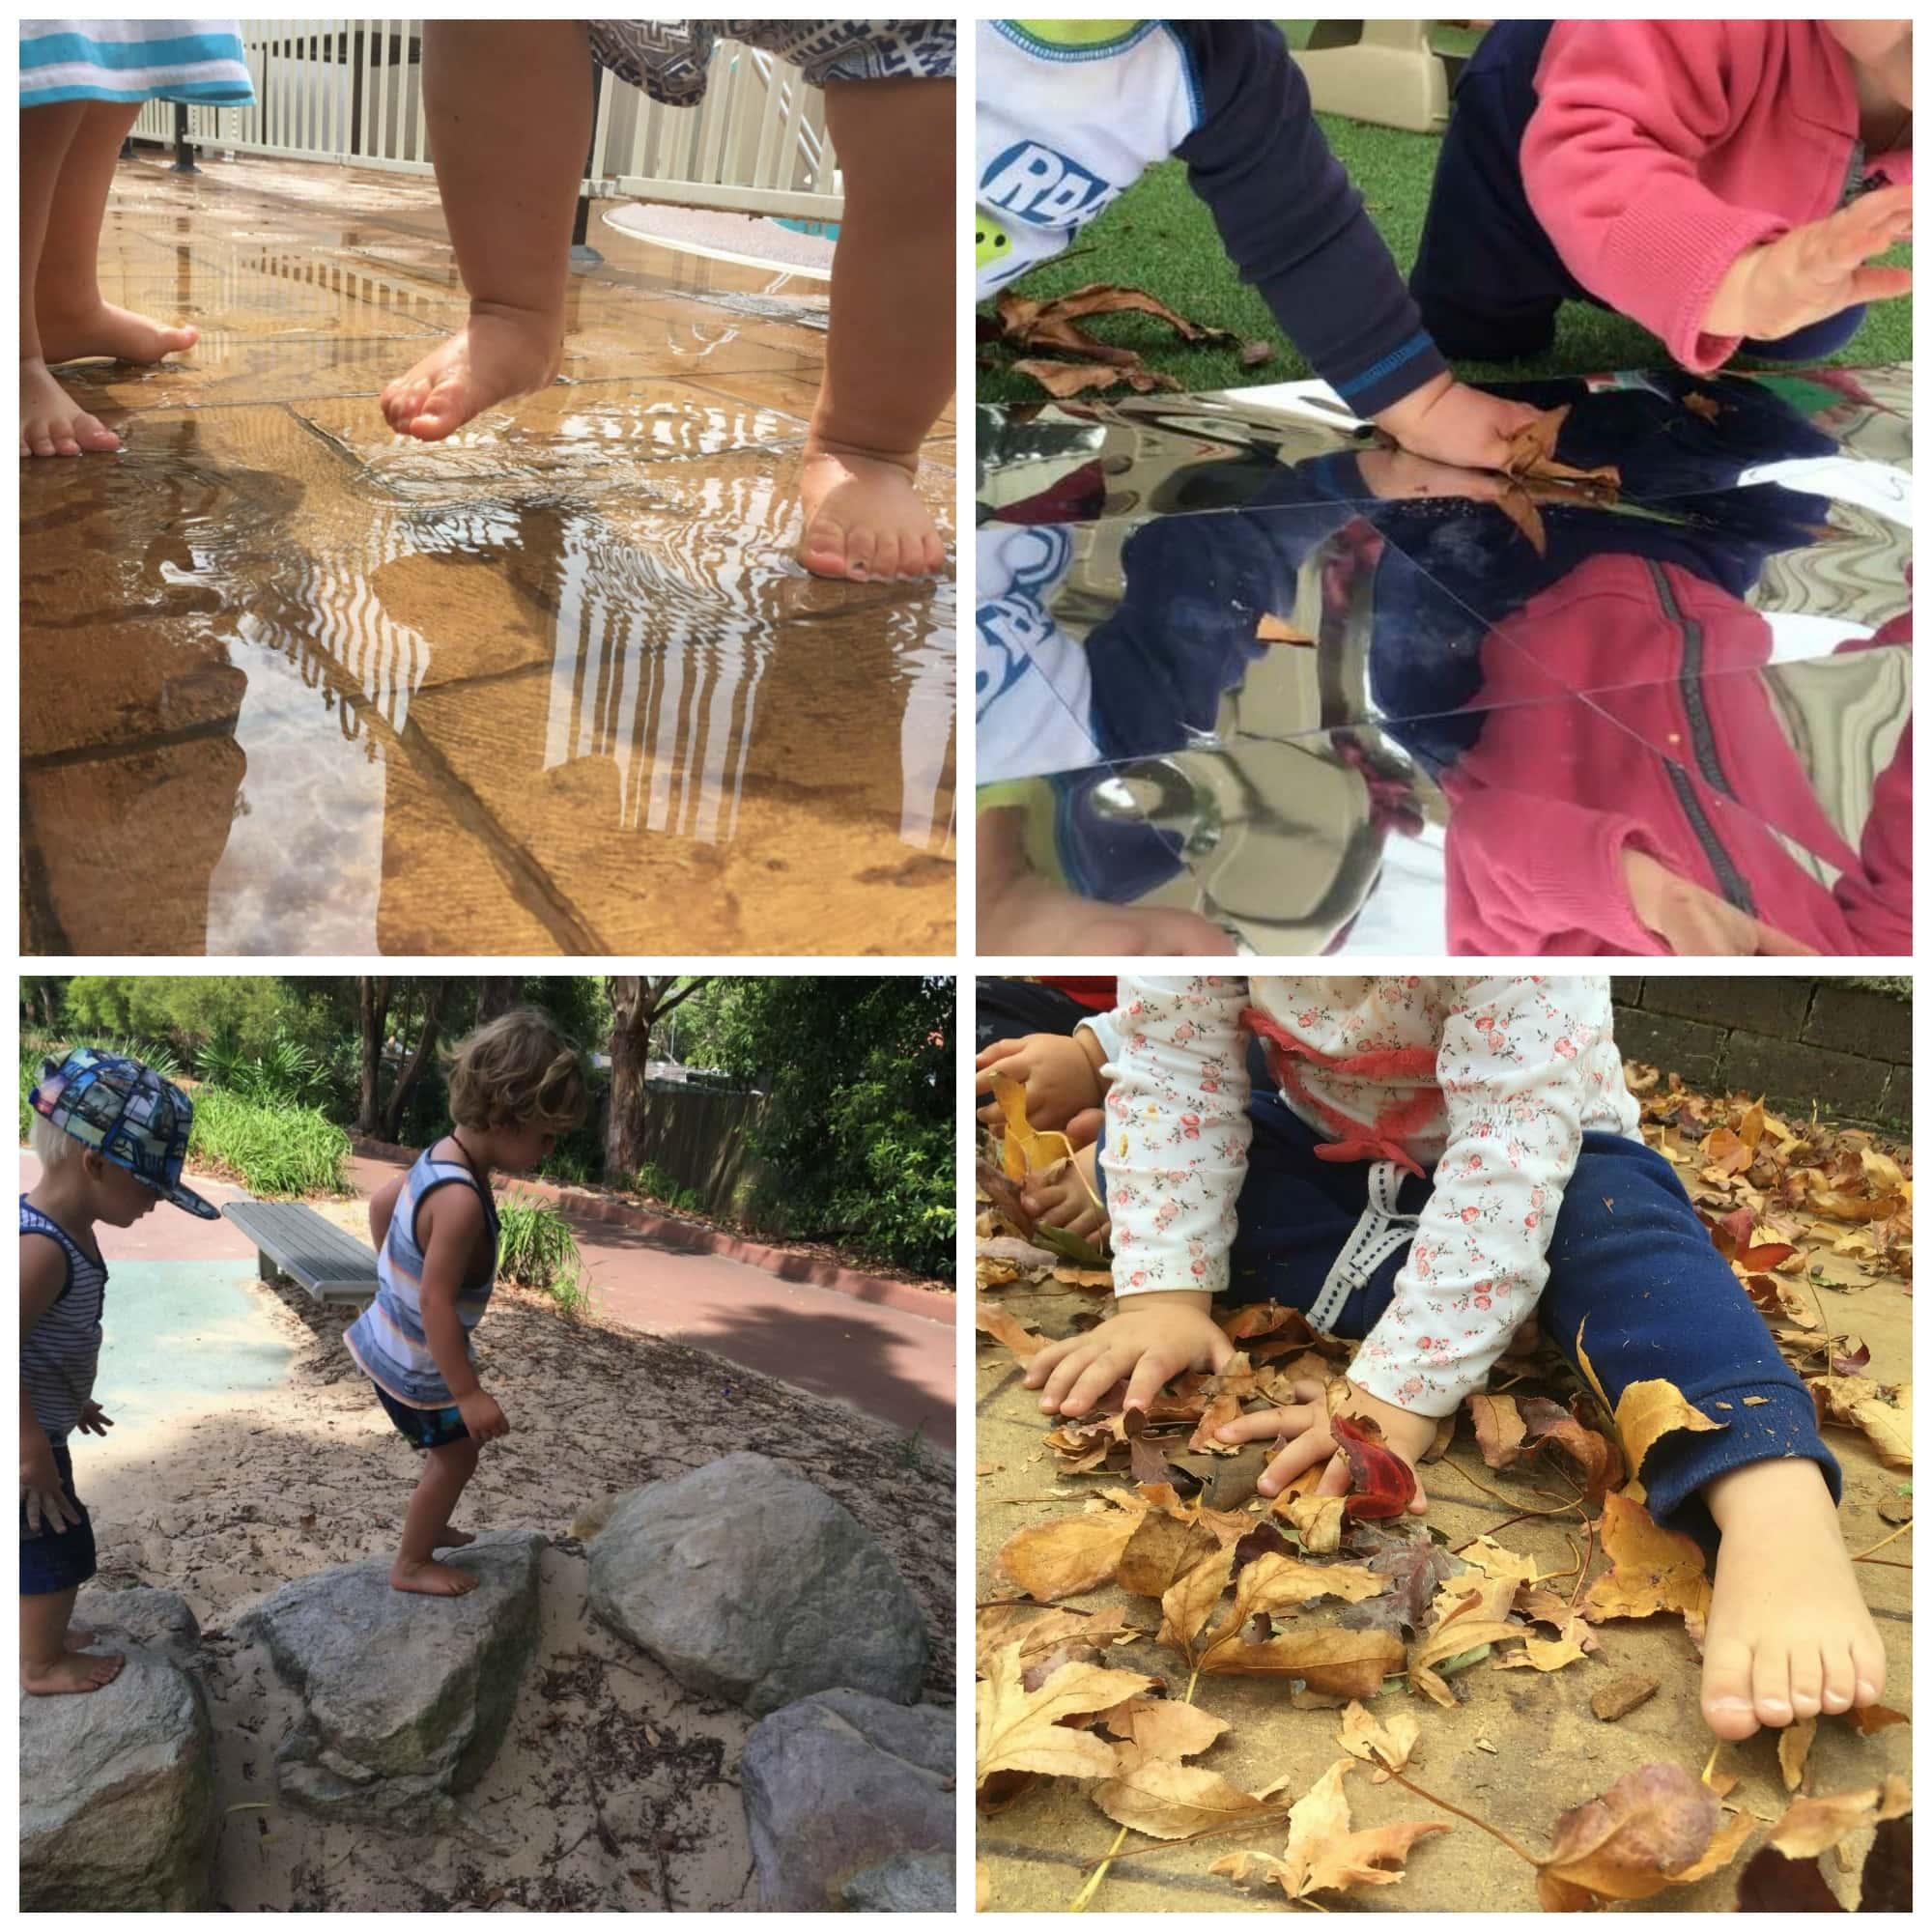 Family Day Care Educators & Environments #5